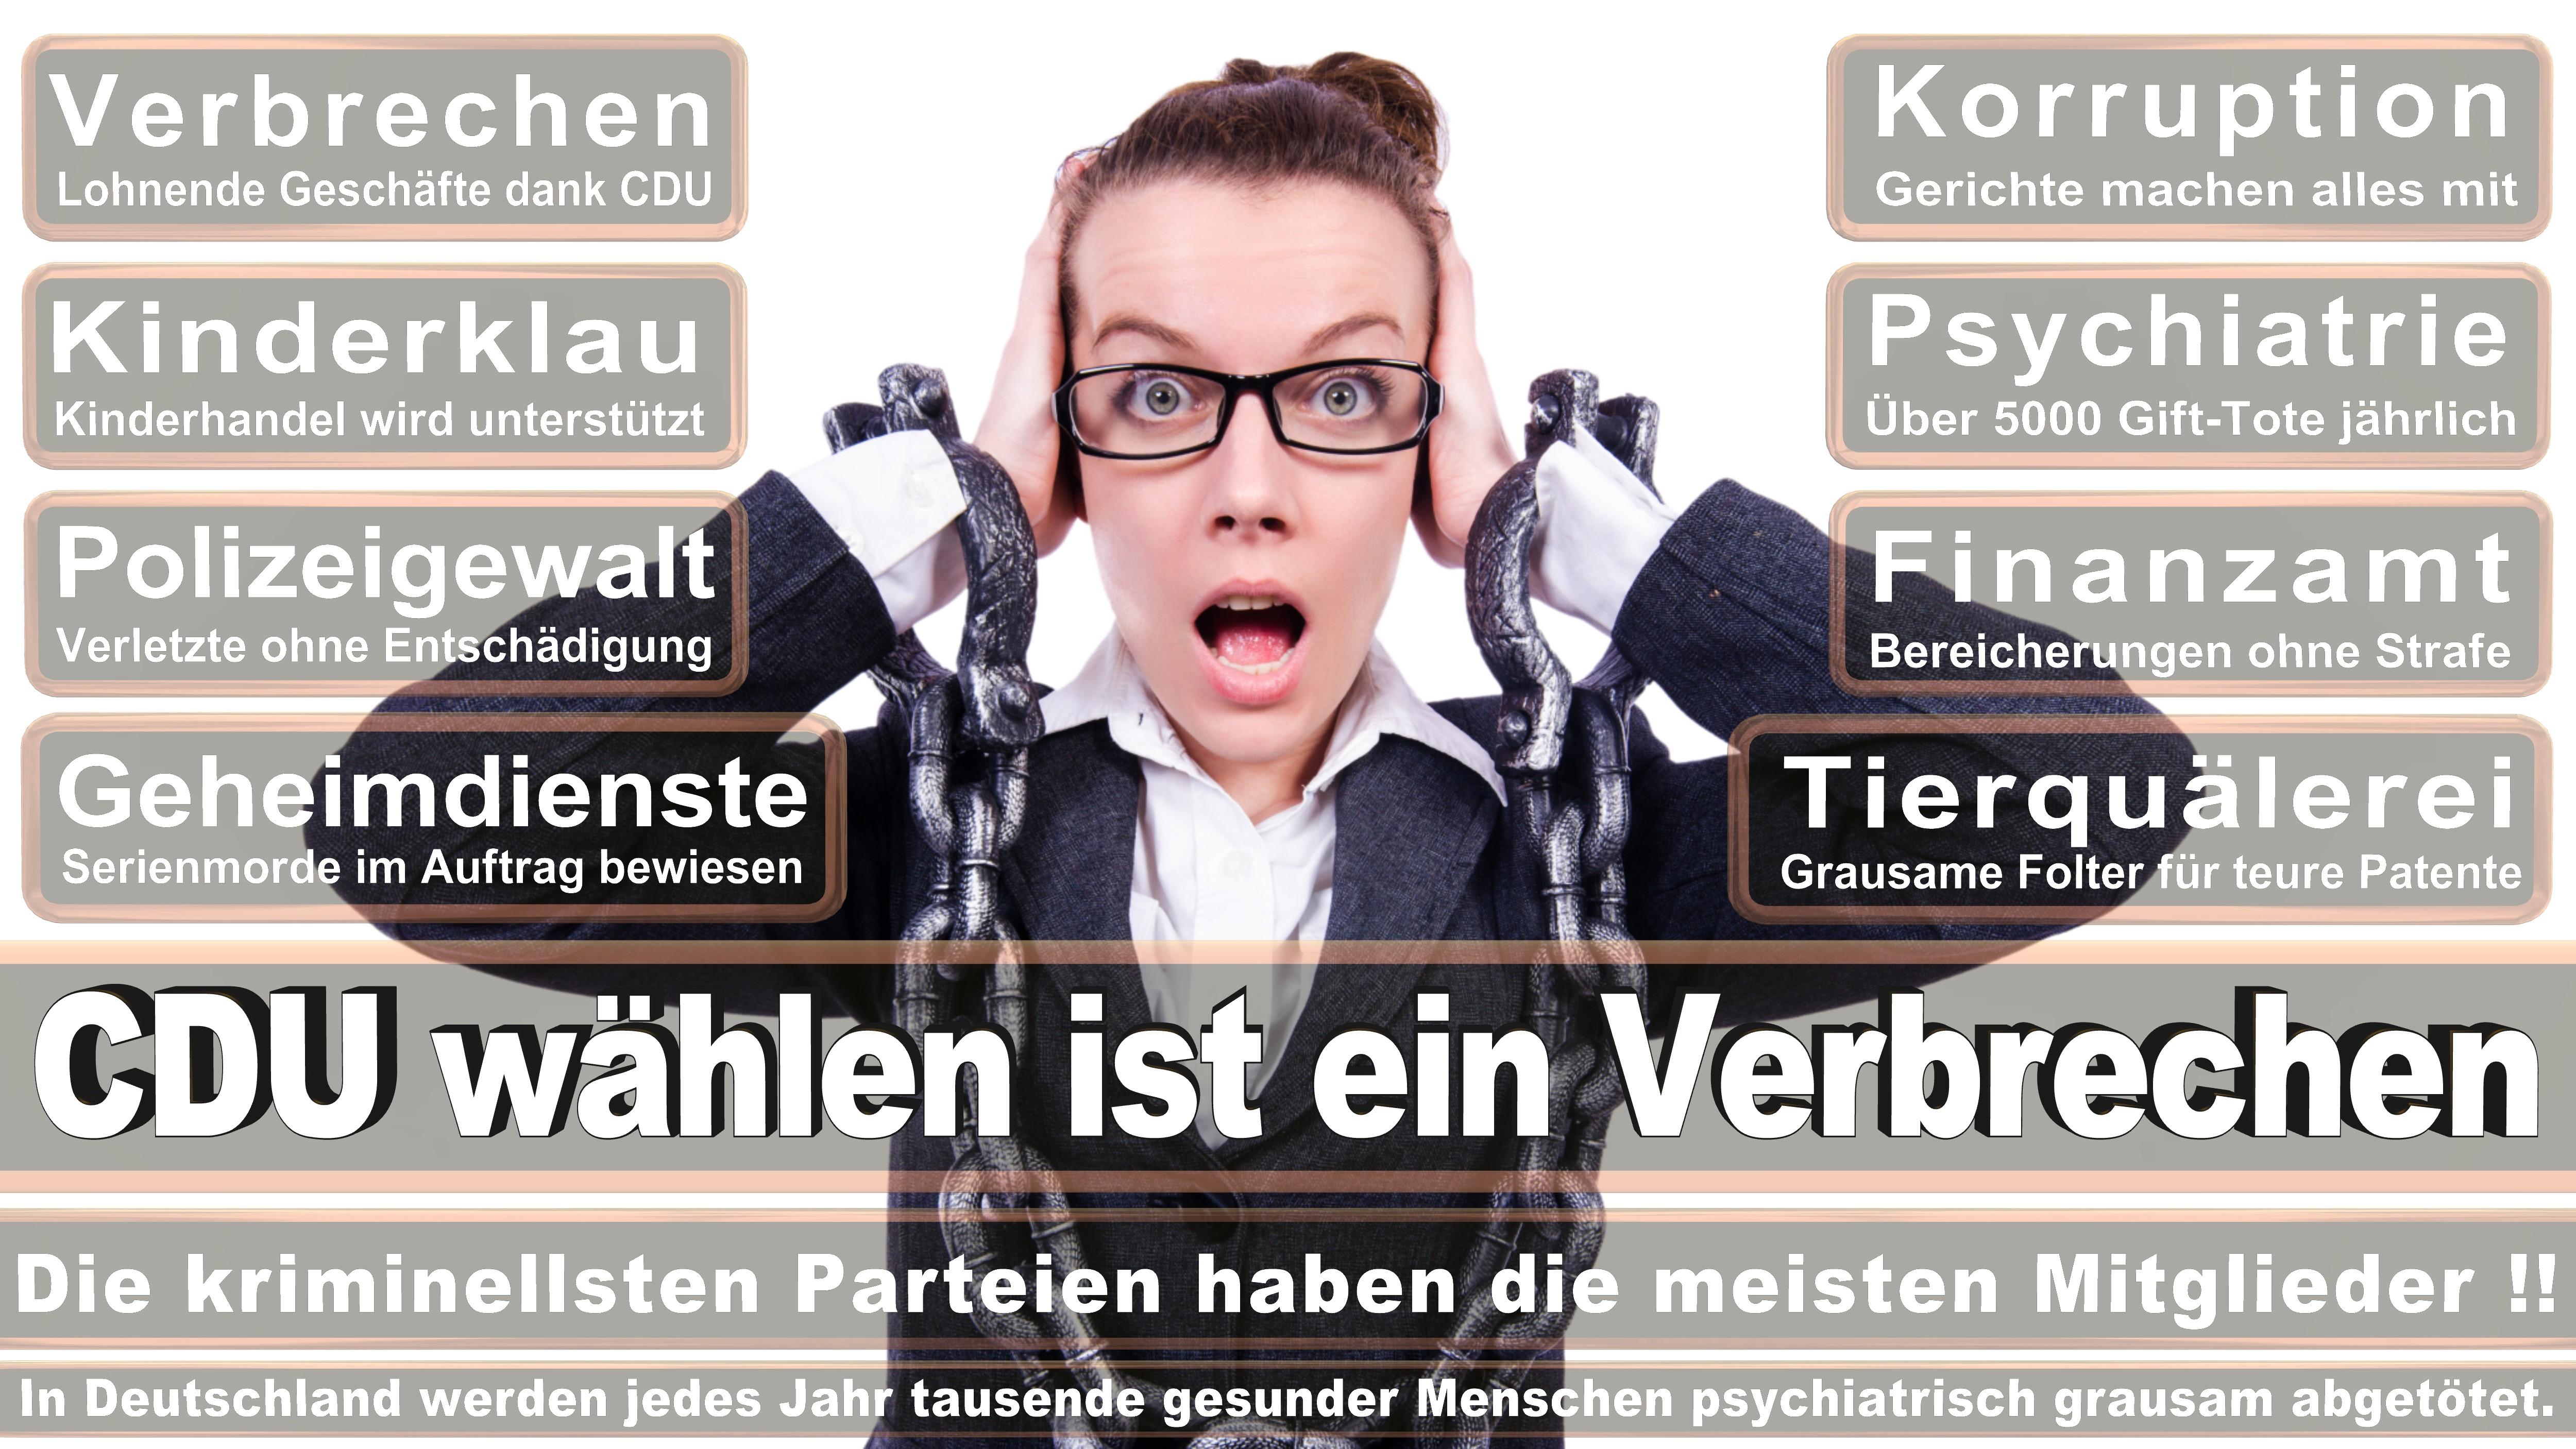 Norbert Barthle CDU CSU Politiker